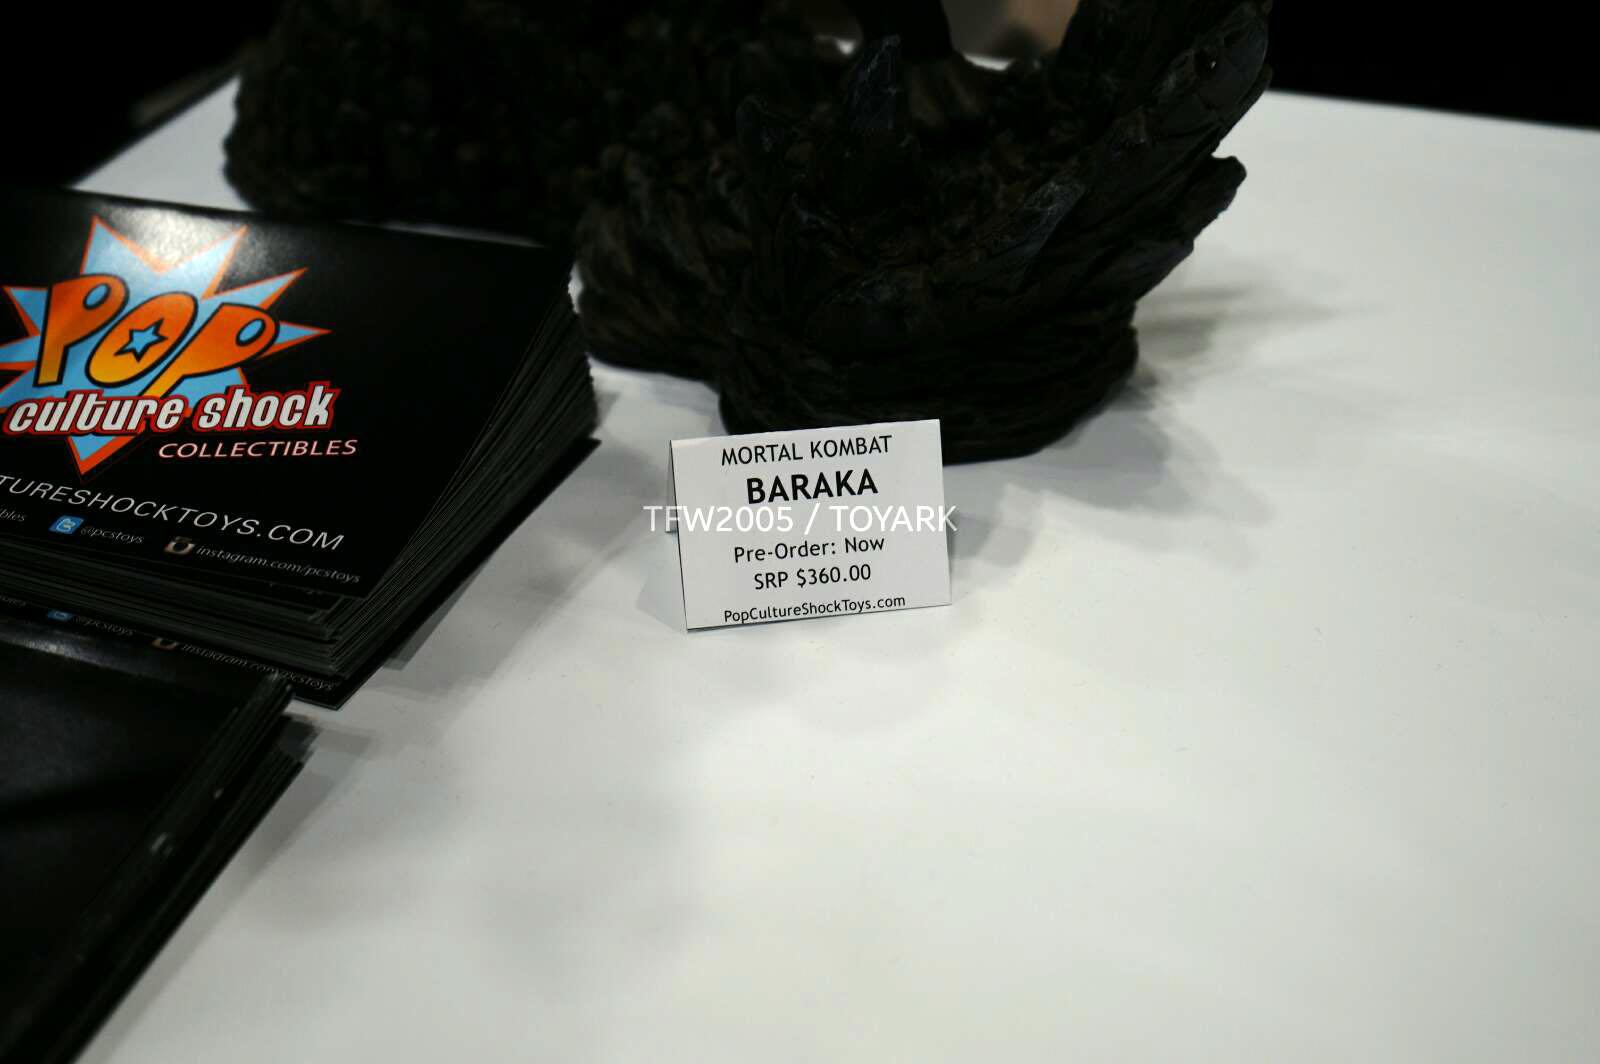 [Pop Culture Shock] Mortal Kombat 9 - Baraka 1/4 scale - Página 3 NYCC-2014-Pop-Culture-Shock-008